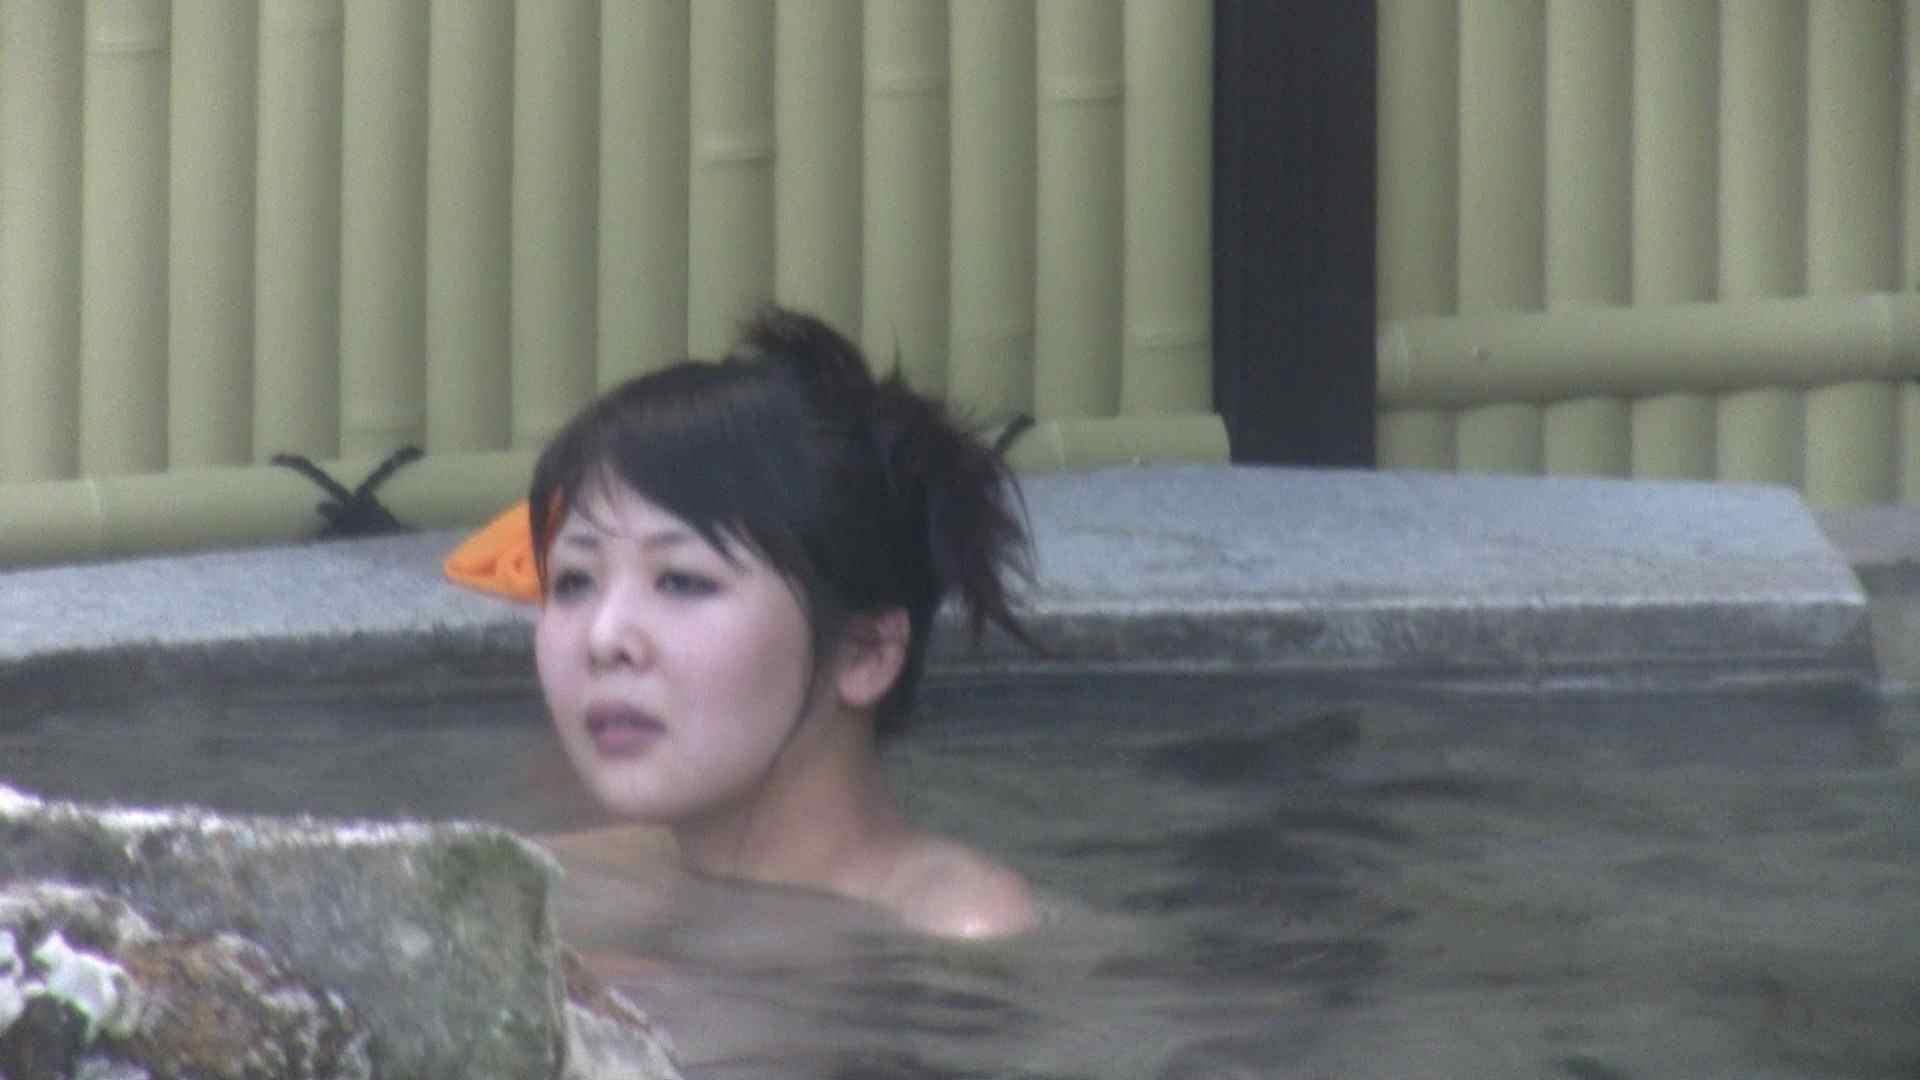 Aquaな露天風呂Vol.118 女体盗撮 隠し撮りAV無料 68連発 2